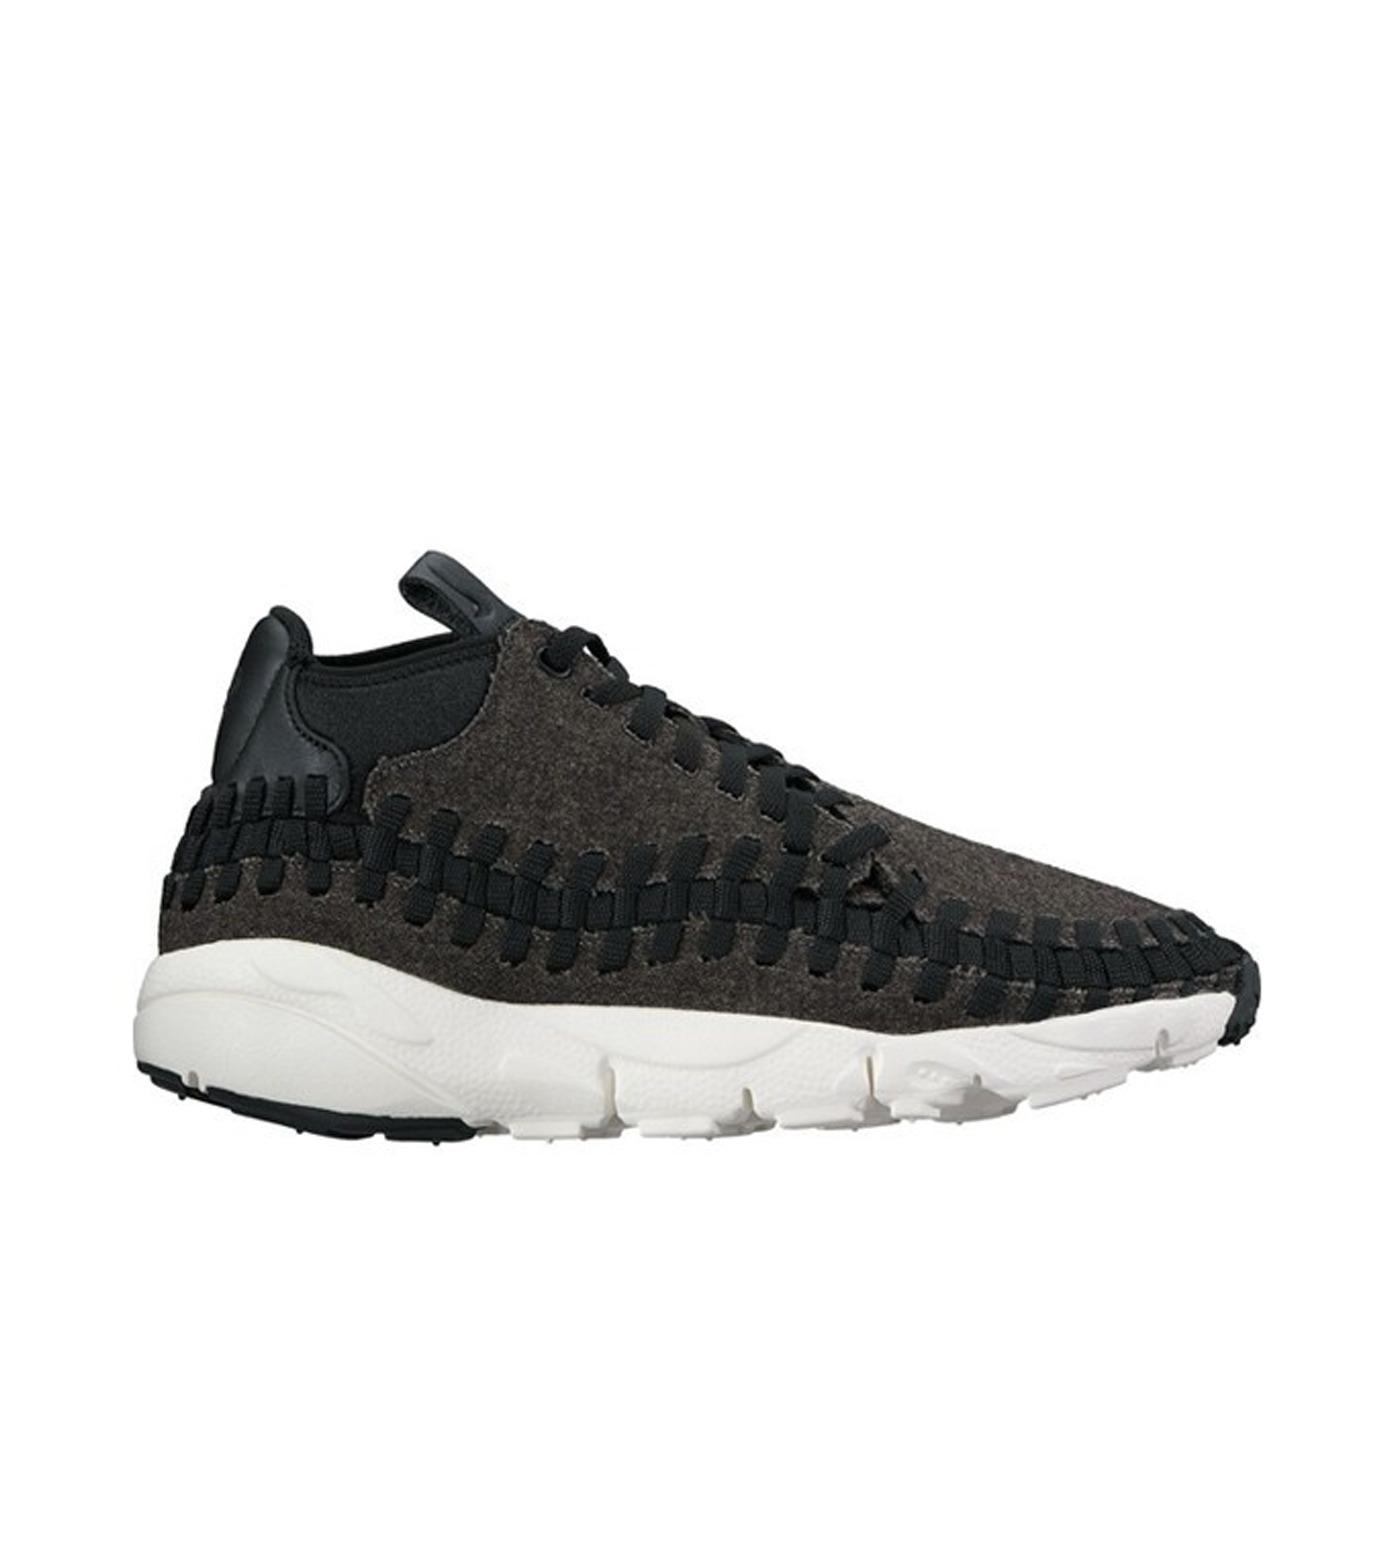 NIKE(ナイキ)のAIR FOOTSCAPE WOVEN CHUKKA SE-BLACK(シューズ/shoes)-857874-001-13 拡大詳細画像1